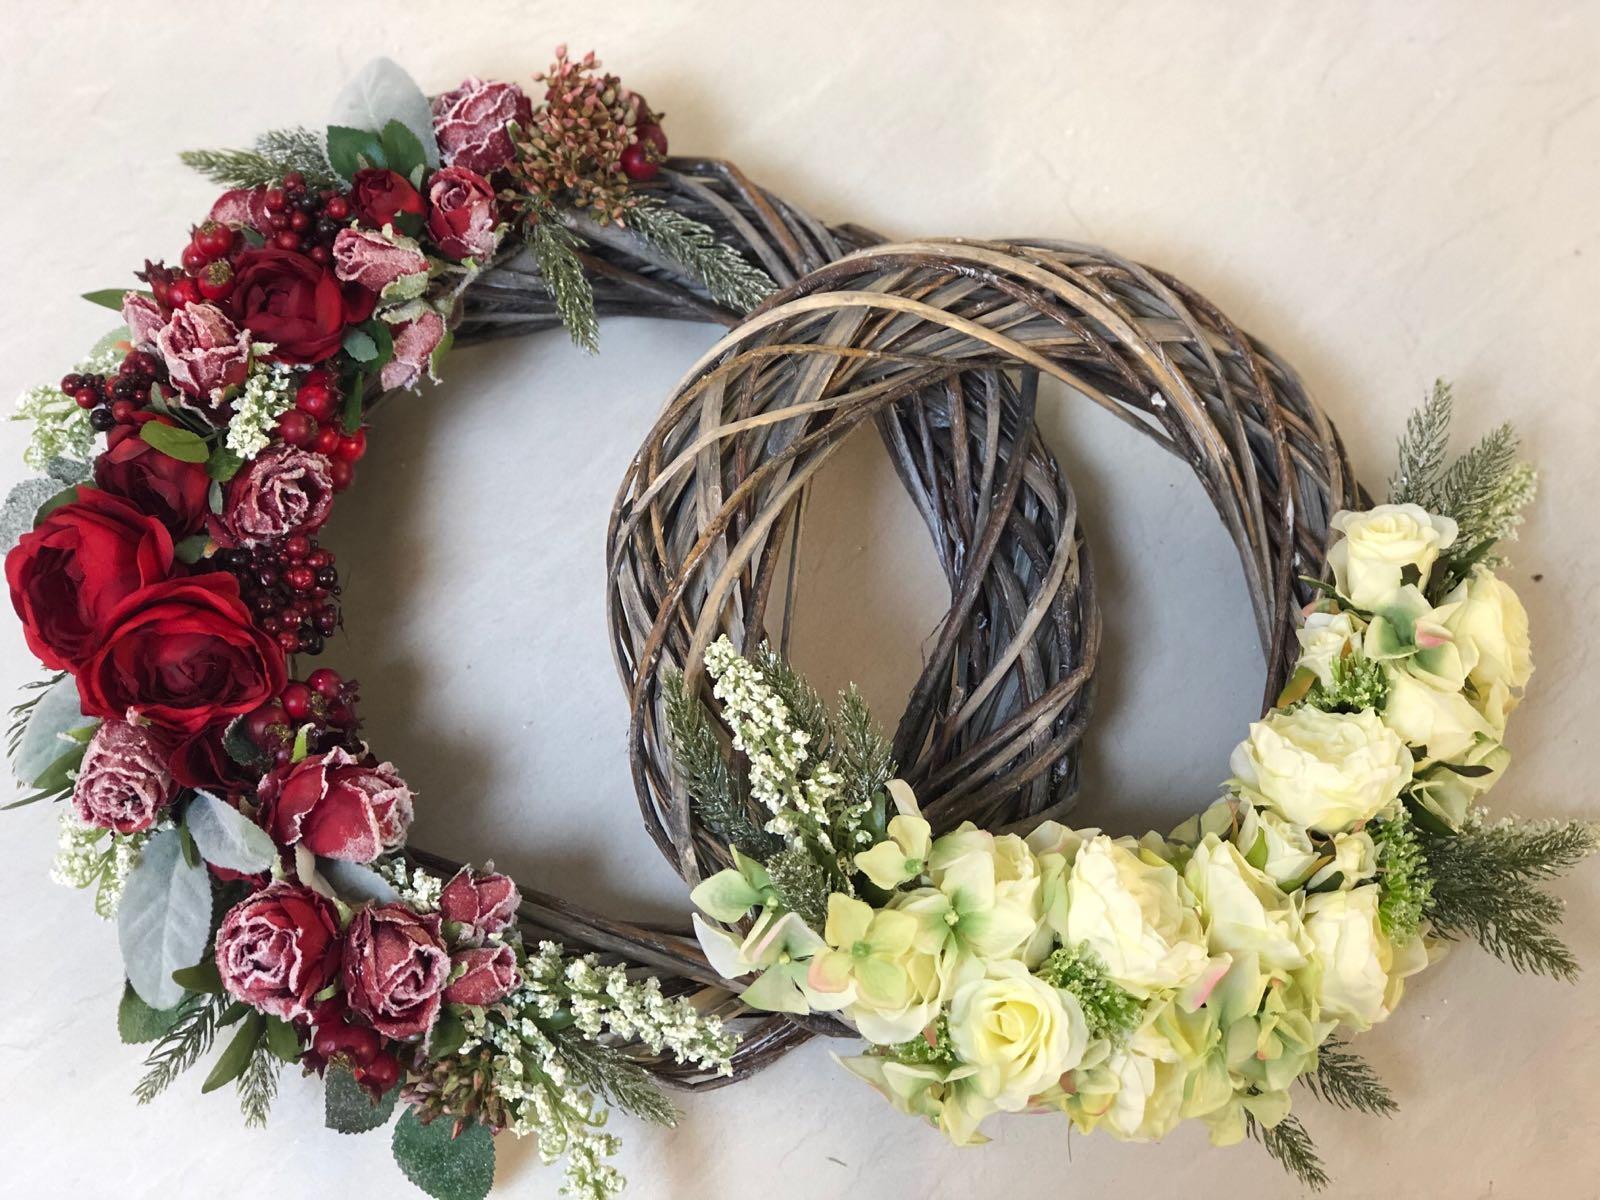 Petals and Peas Cream Winter Wreath 36cm approx